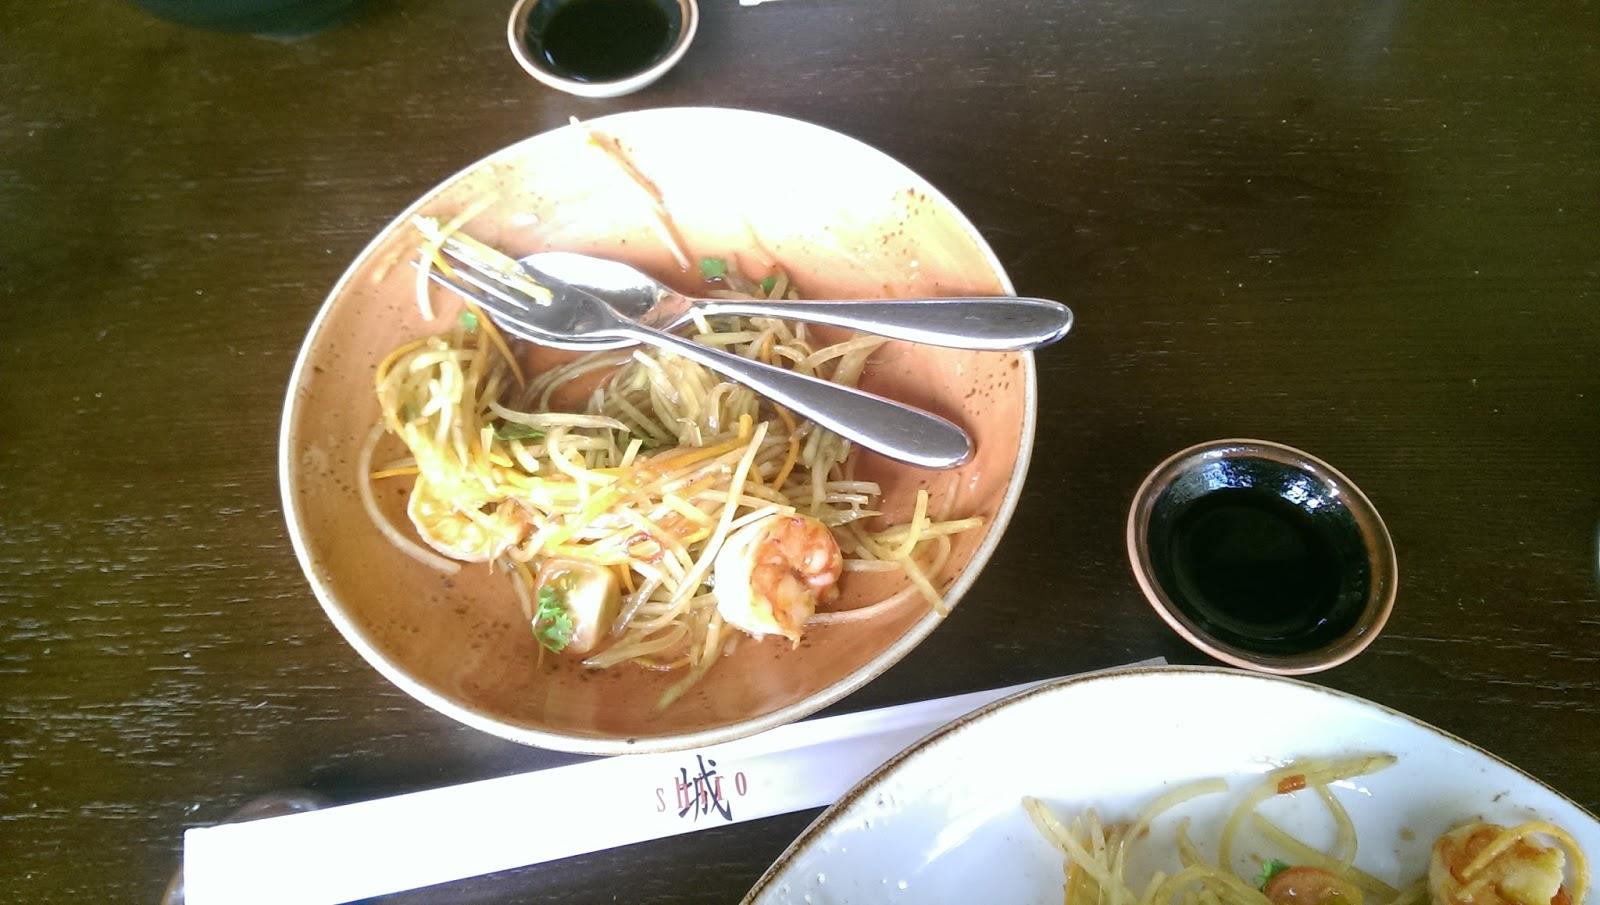 shiro-Japanese-restaurant-victoria-island-lagos-landmark-event-centre-weddings-weekend-naija-eat-food-fashion-lifestyle-fashionista-fitness-career-designer